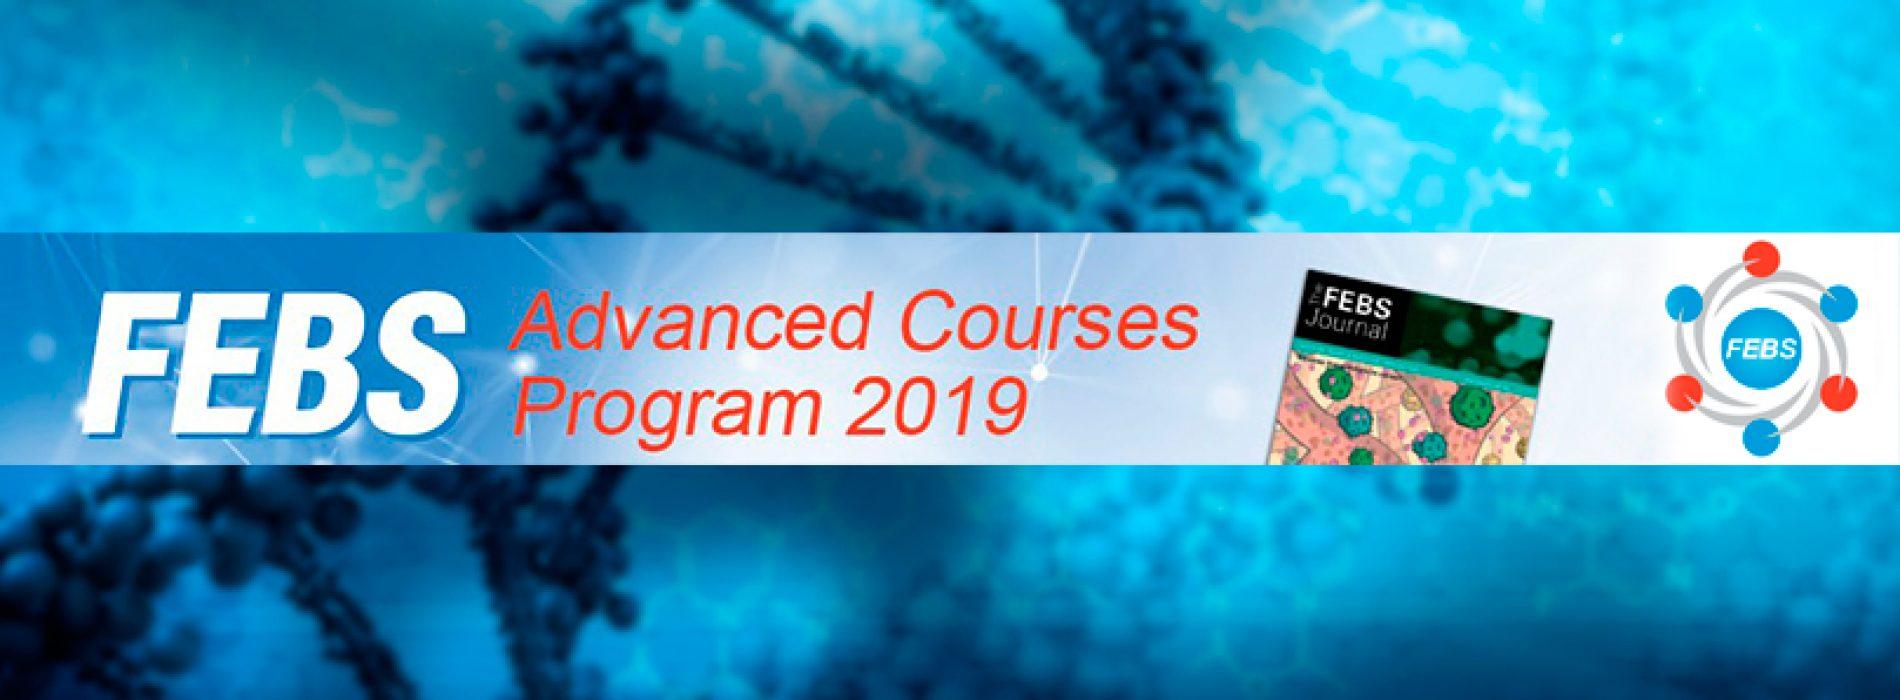 FEBS Advanced Courses Program 2019